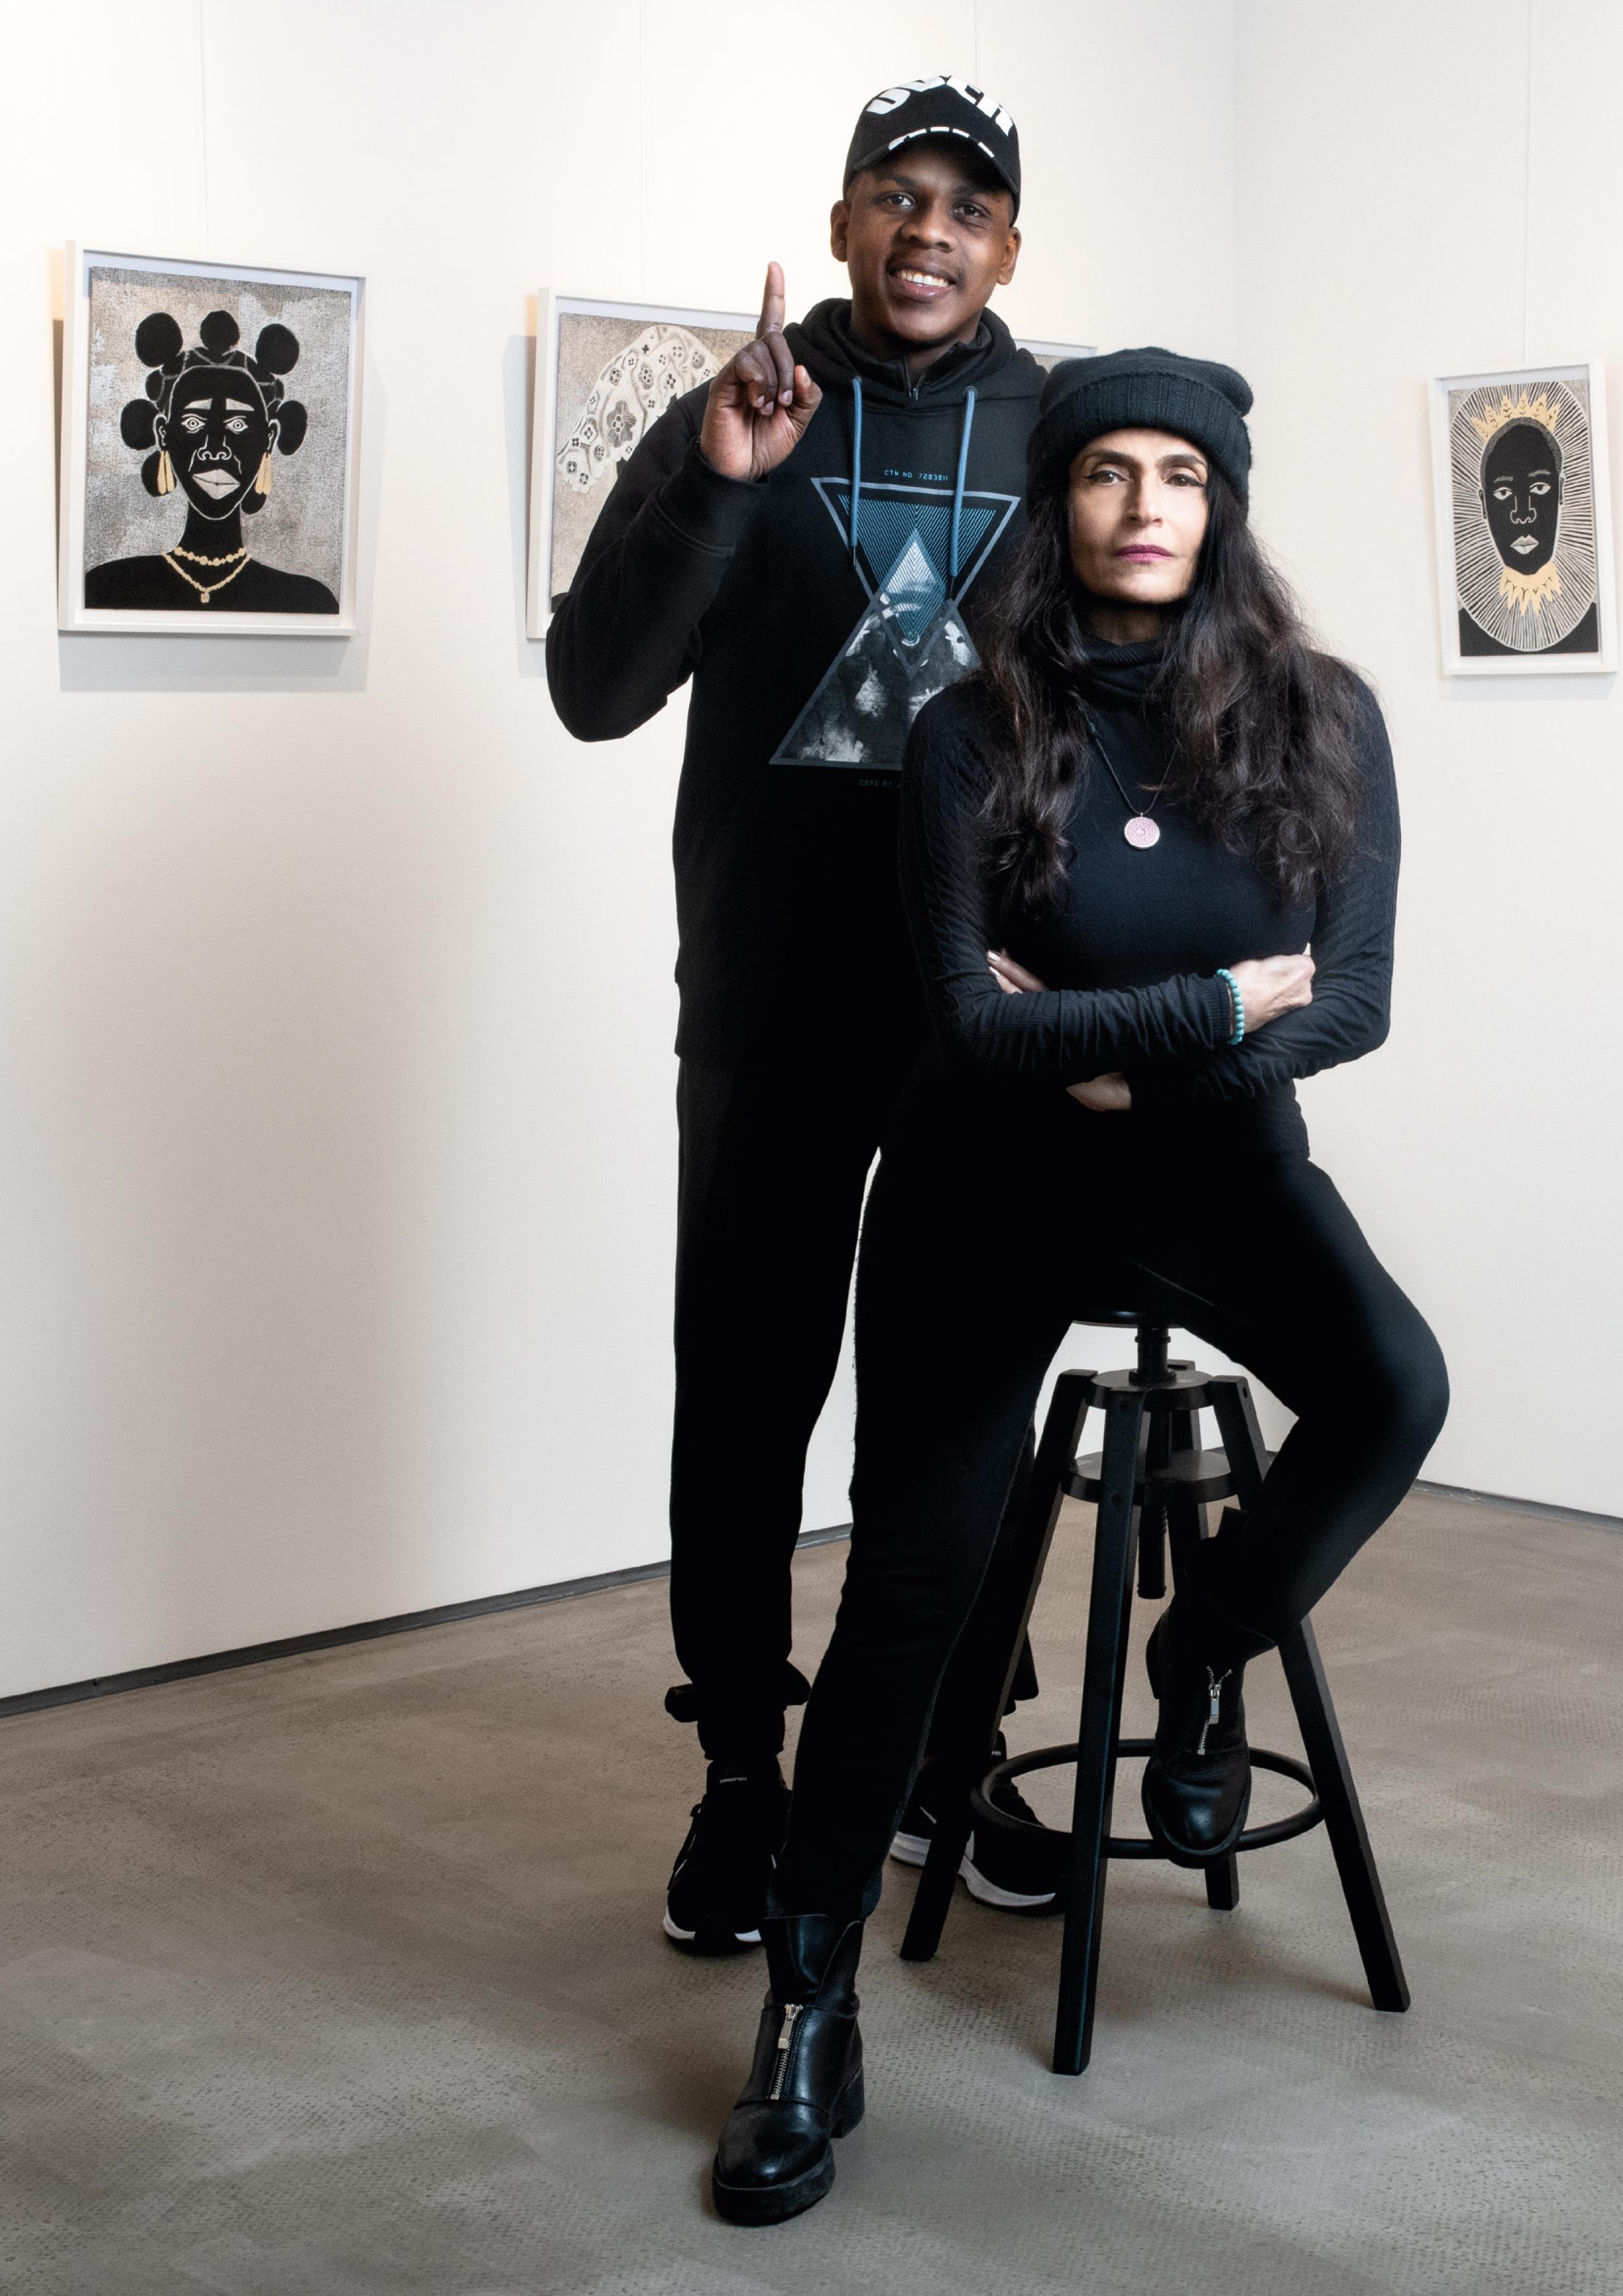 O'Maurice Mboa & Parissa de Montenach, März 2019